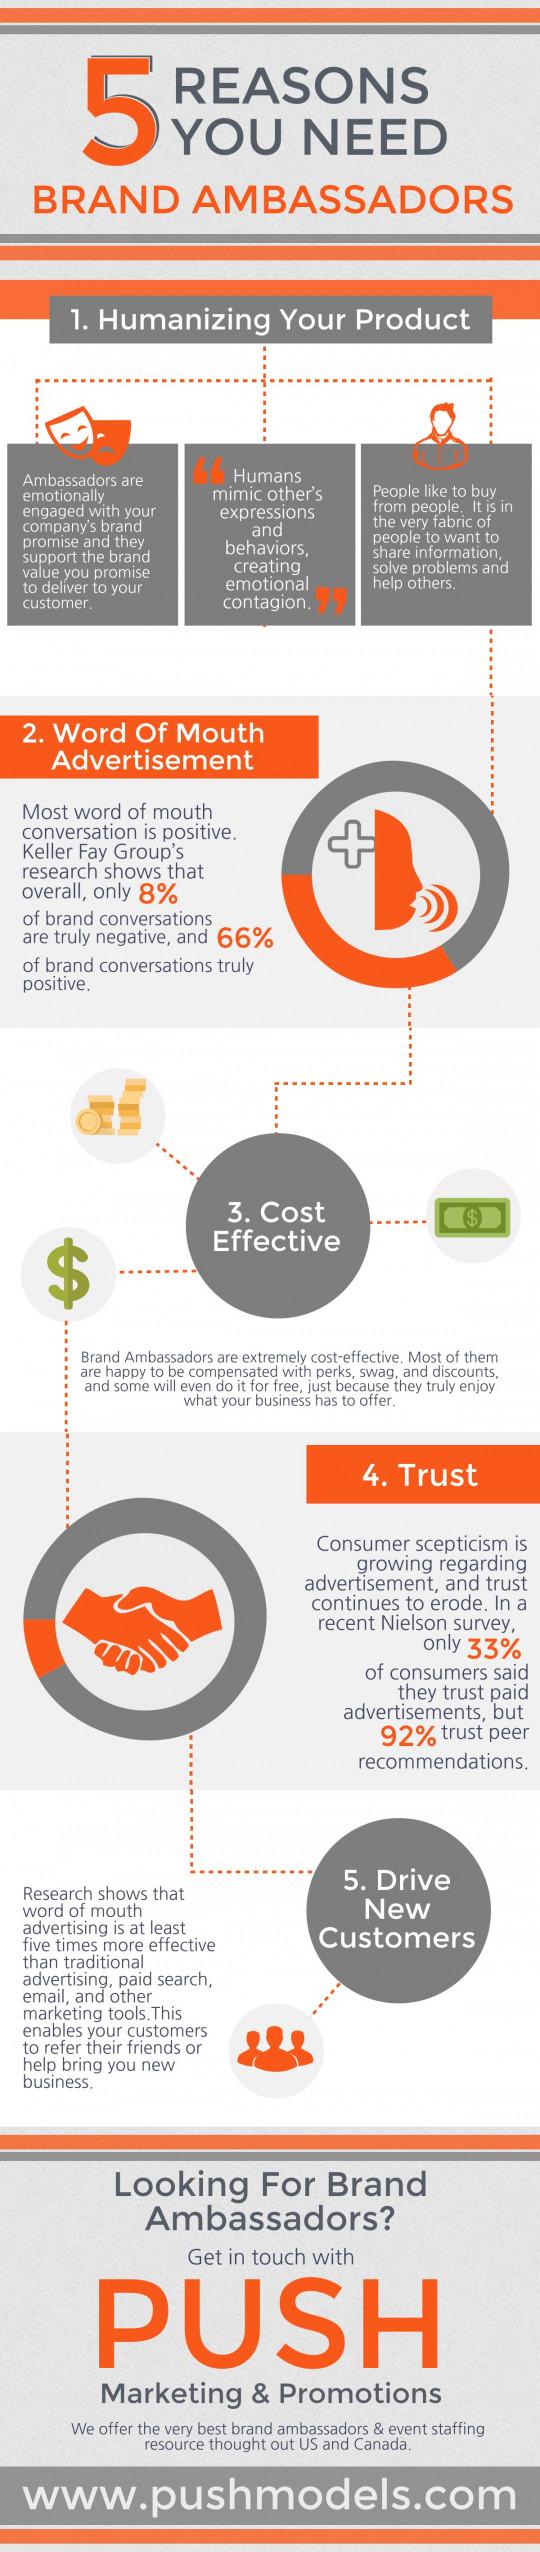 5 Reasons you need Brand Ambassadors